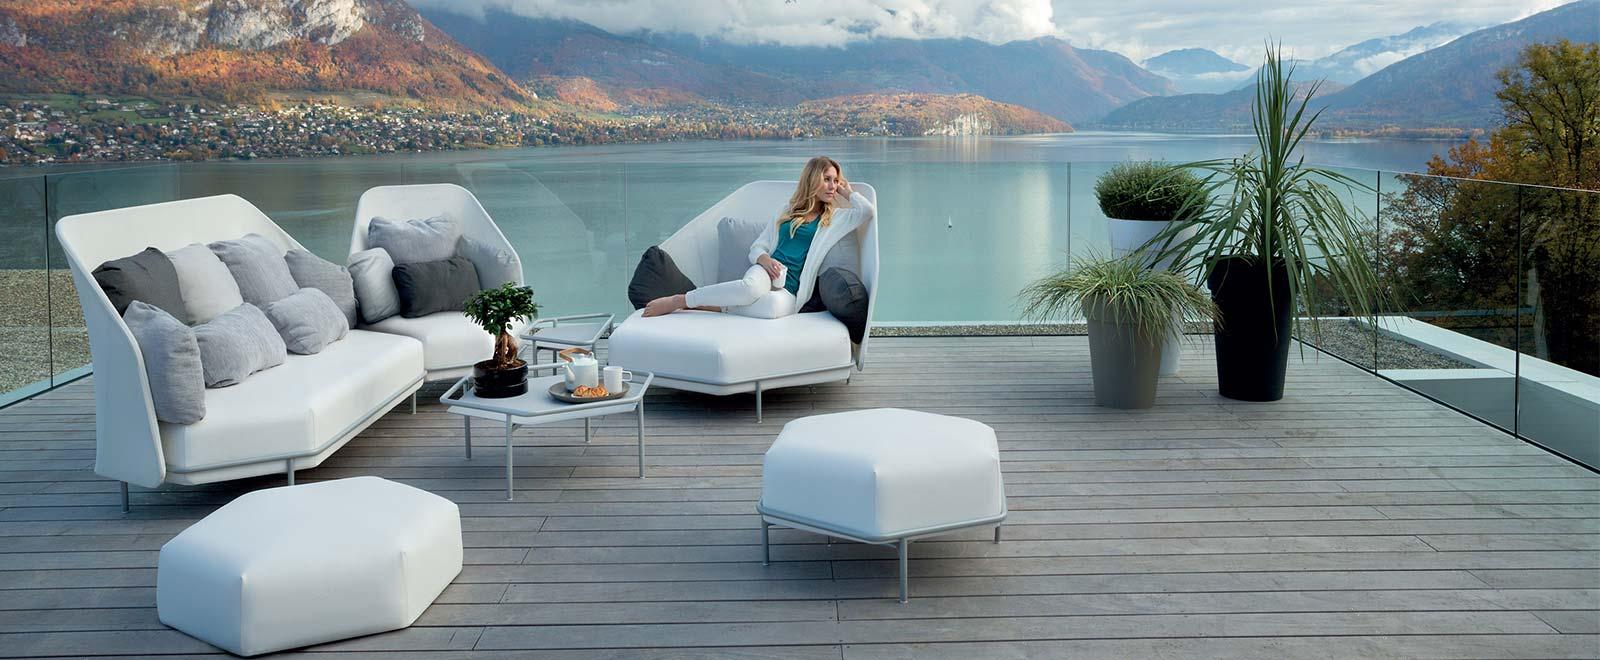 die agentur f r design outdoor m bel. Black Bedroom Furniture Sets. Home Design Ideas